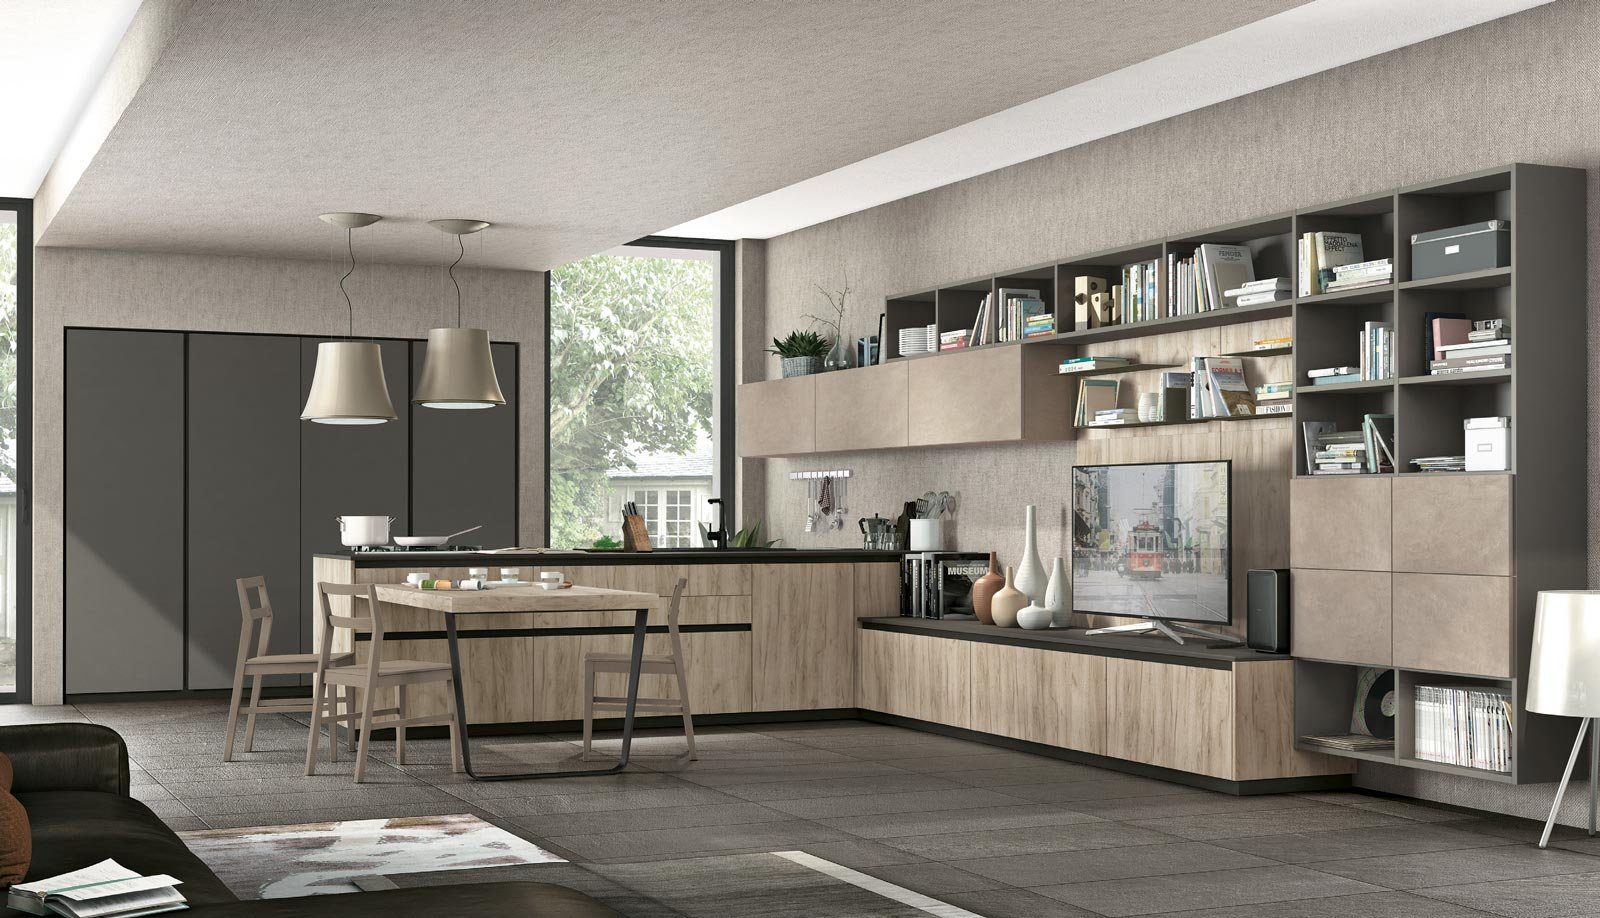 Eurocucina 2016: superfici soft touch per le nuove cucine - Cose di Casa